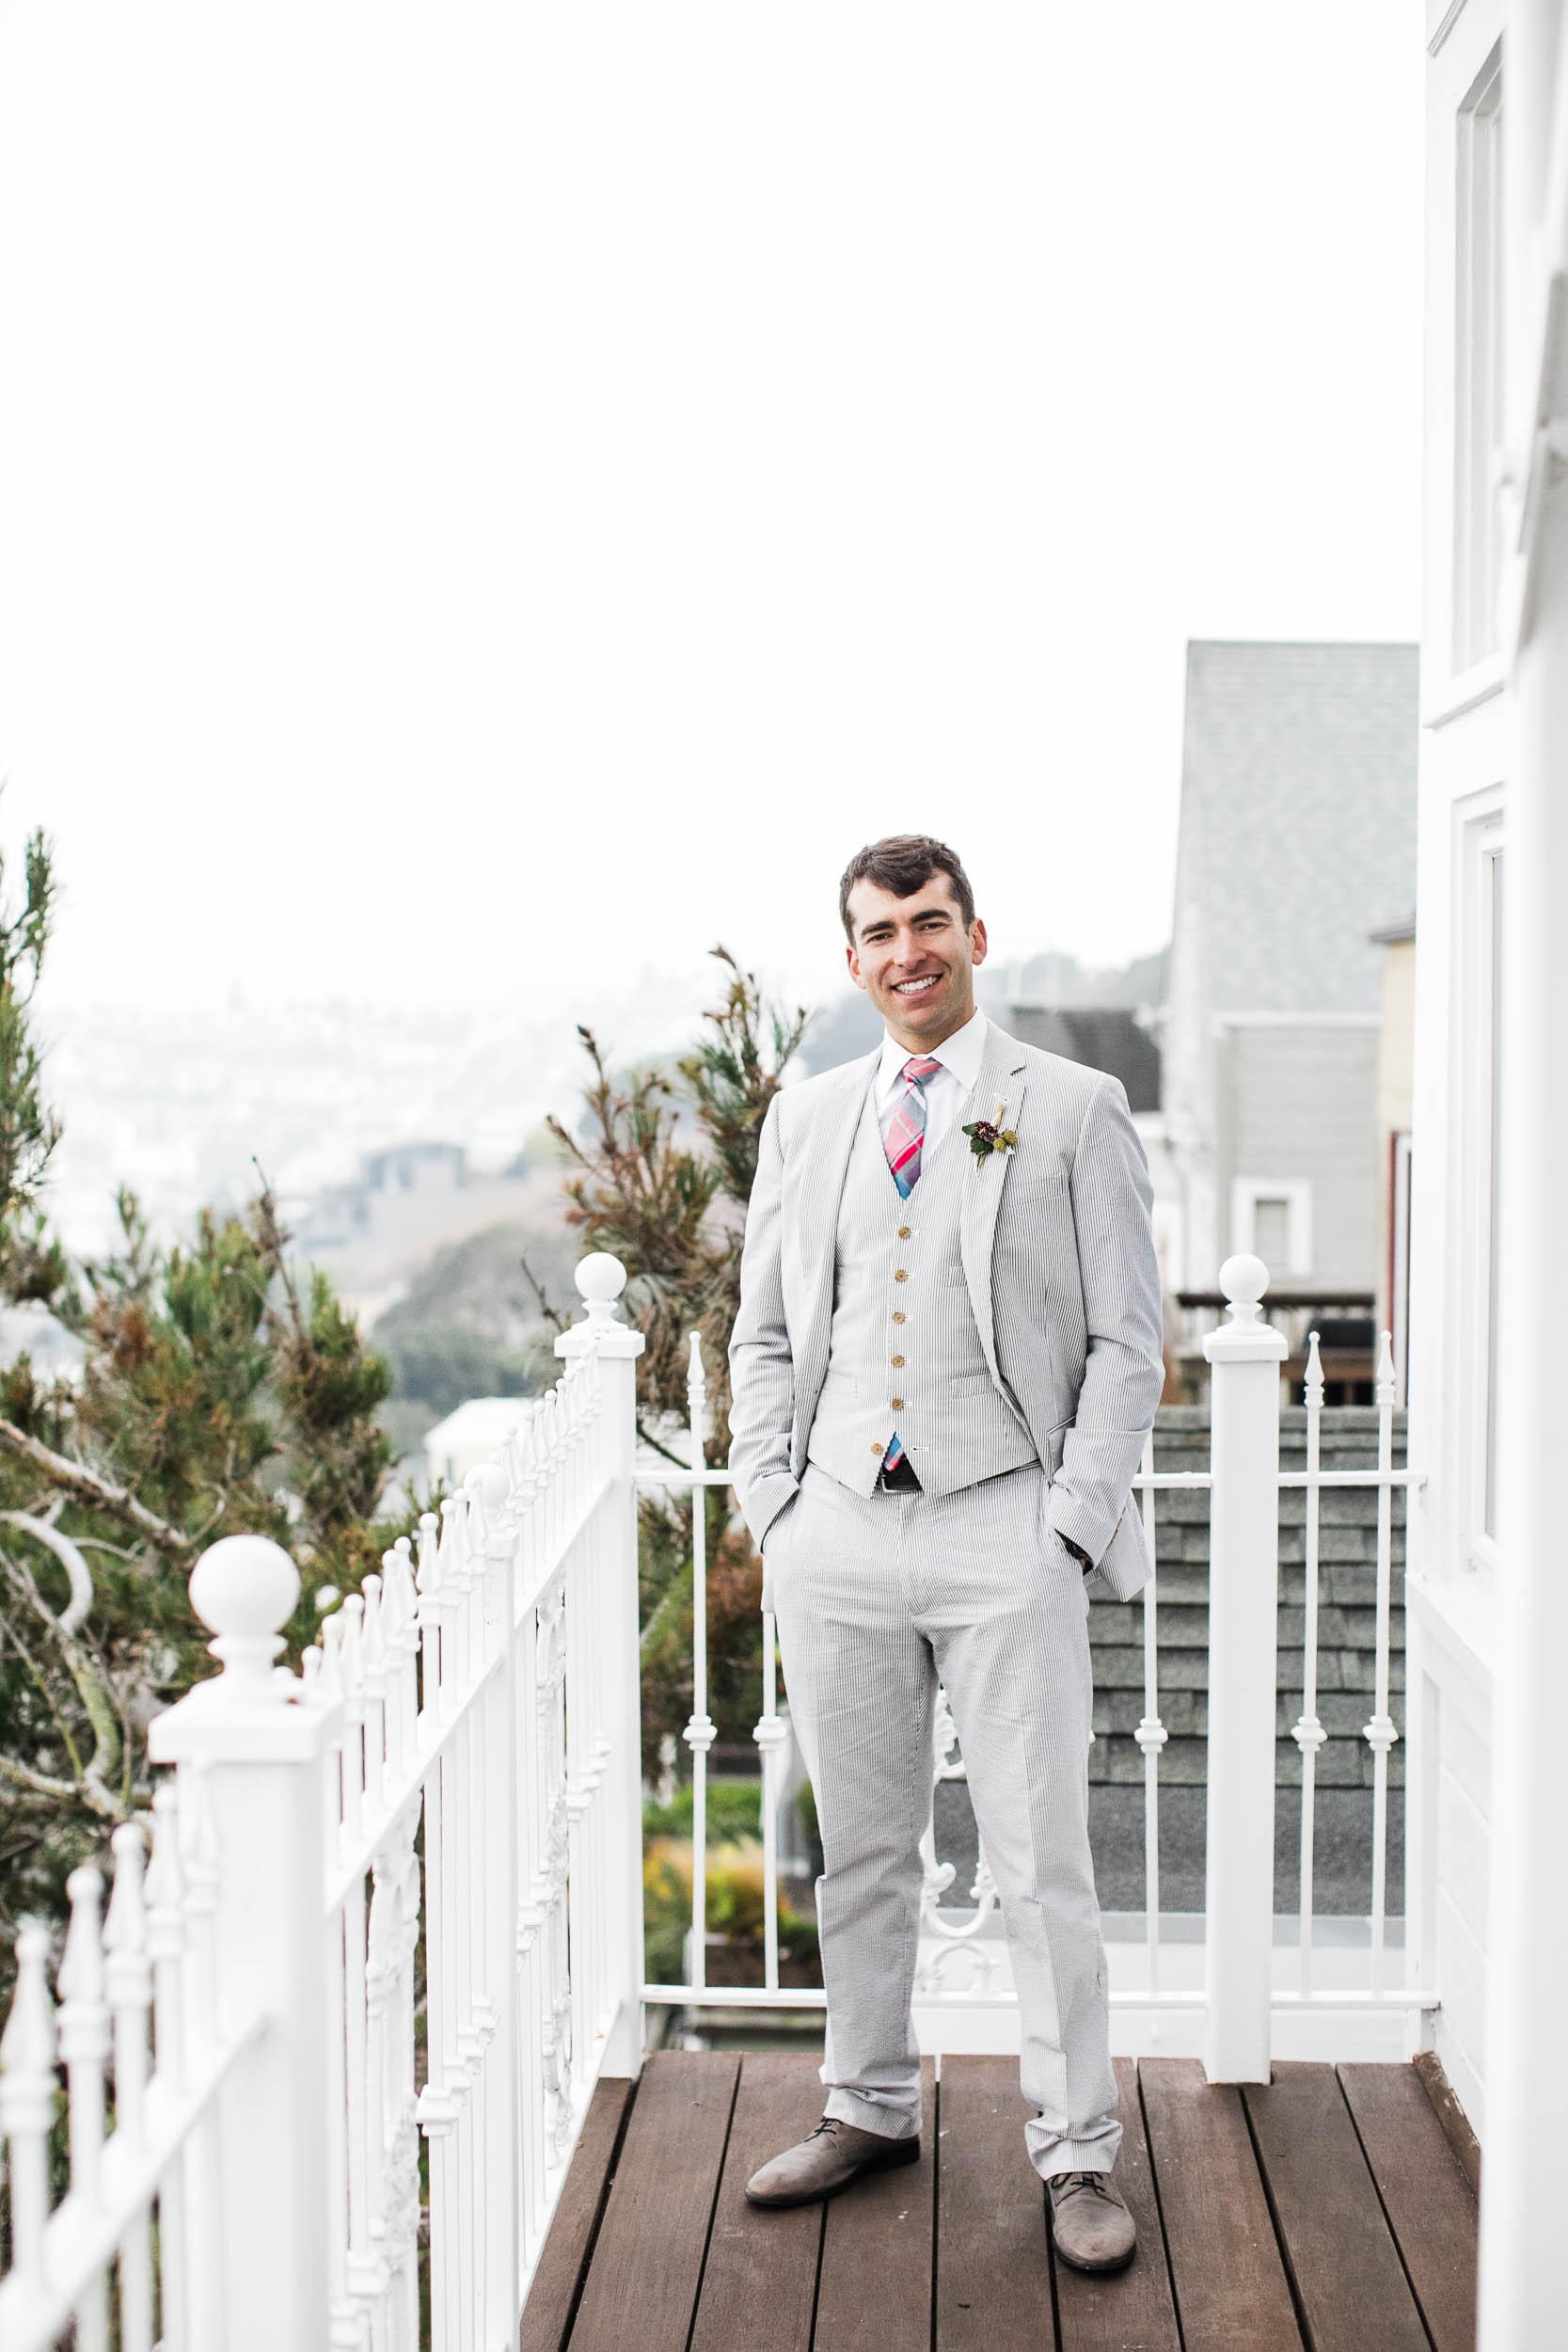 081818_Alina Jason San Francisco Wedding_Buena Lane Photography_2027.jpg